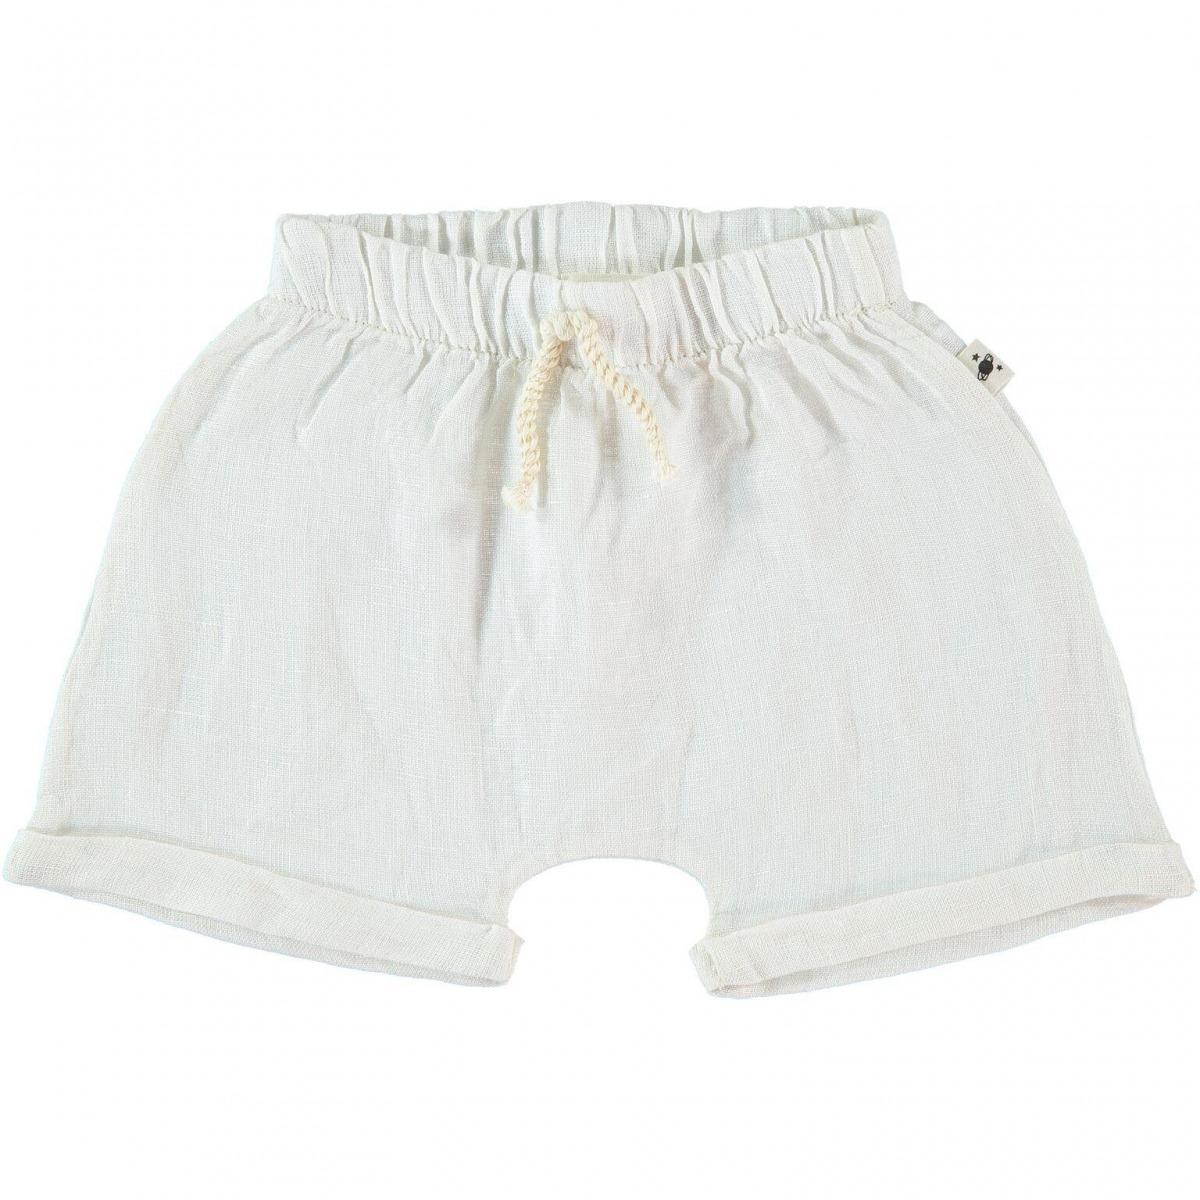 6cf15a6864 Short lino Sitges blanco roto de My Little Cozmo. Moda bebé.